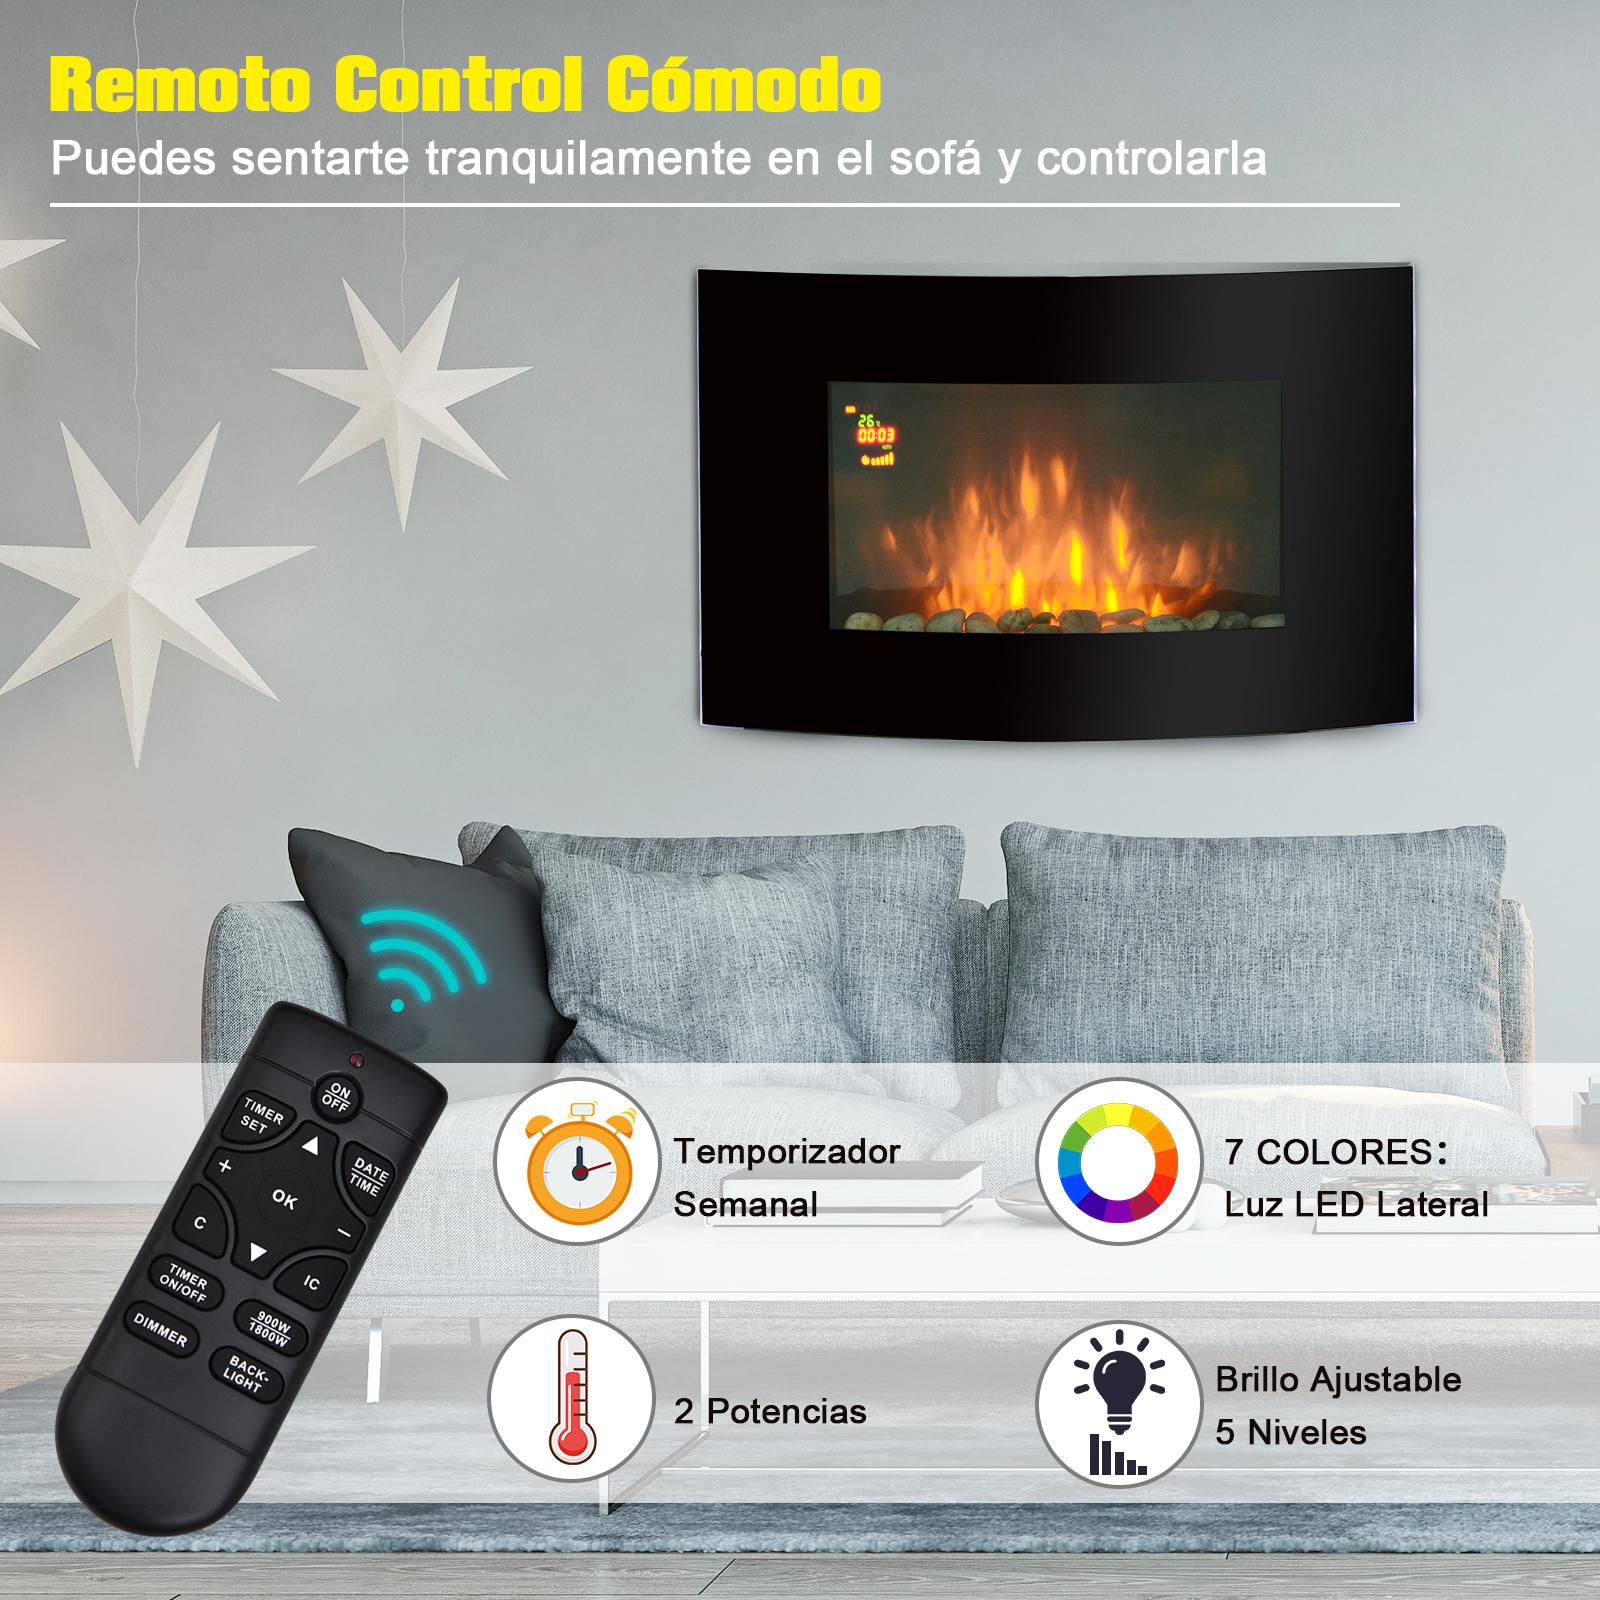 Chimenea-Electrica-de-Pared-Vertical-Estufas-Electricas-Llama-LED-6-Tipos-Nuevo miniatura 39